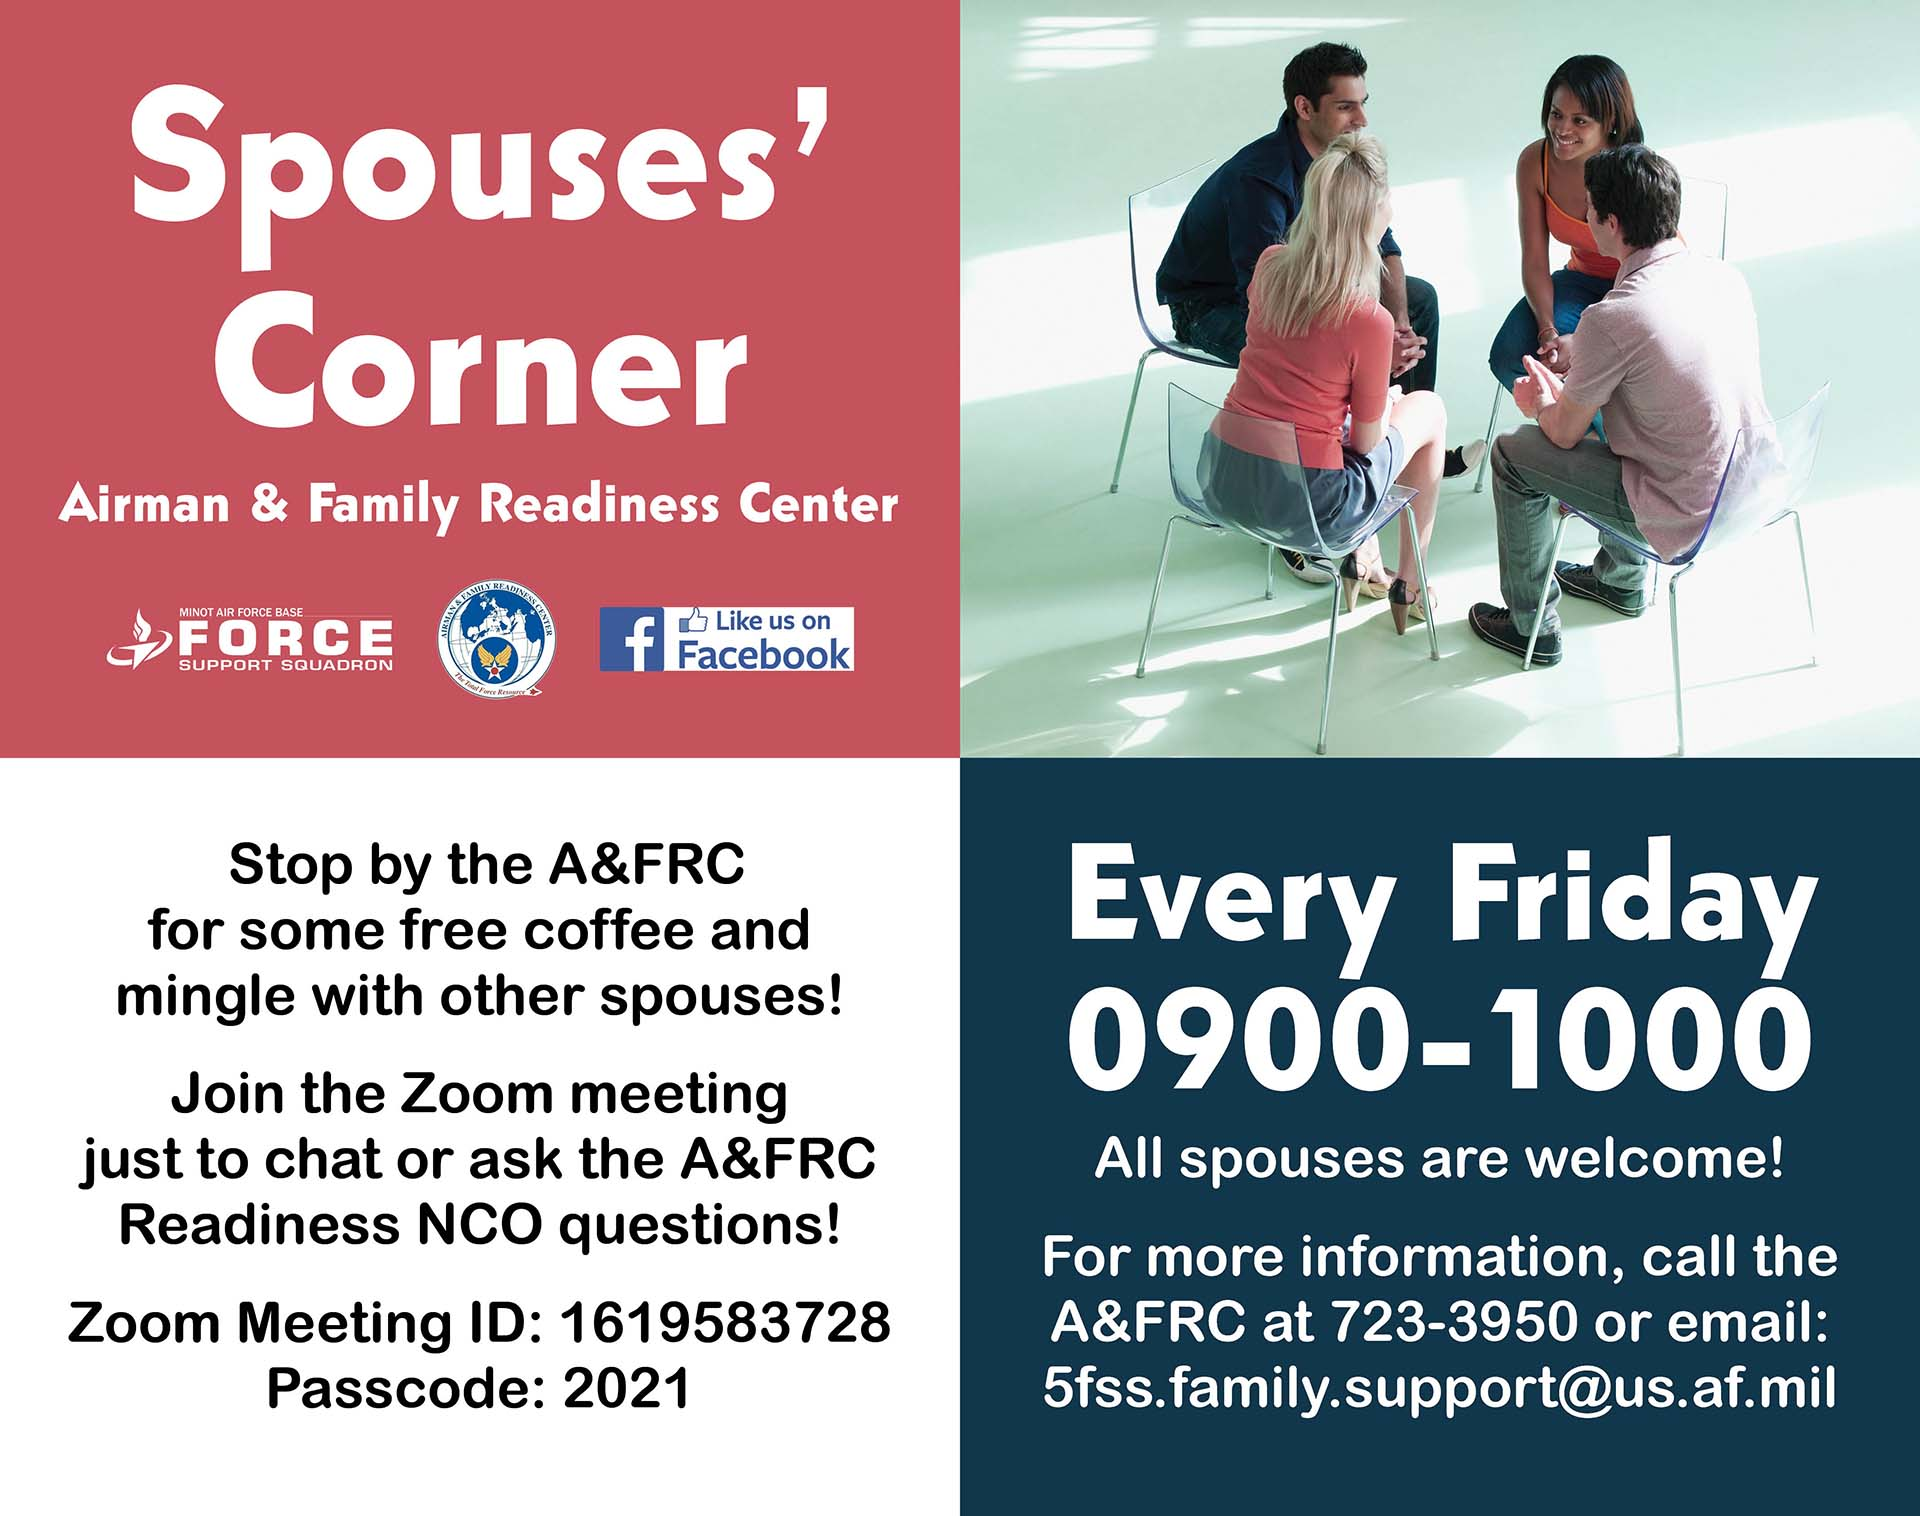 Spouses Corner